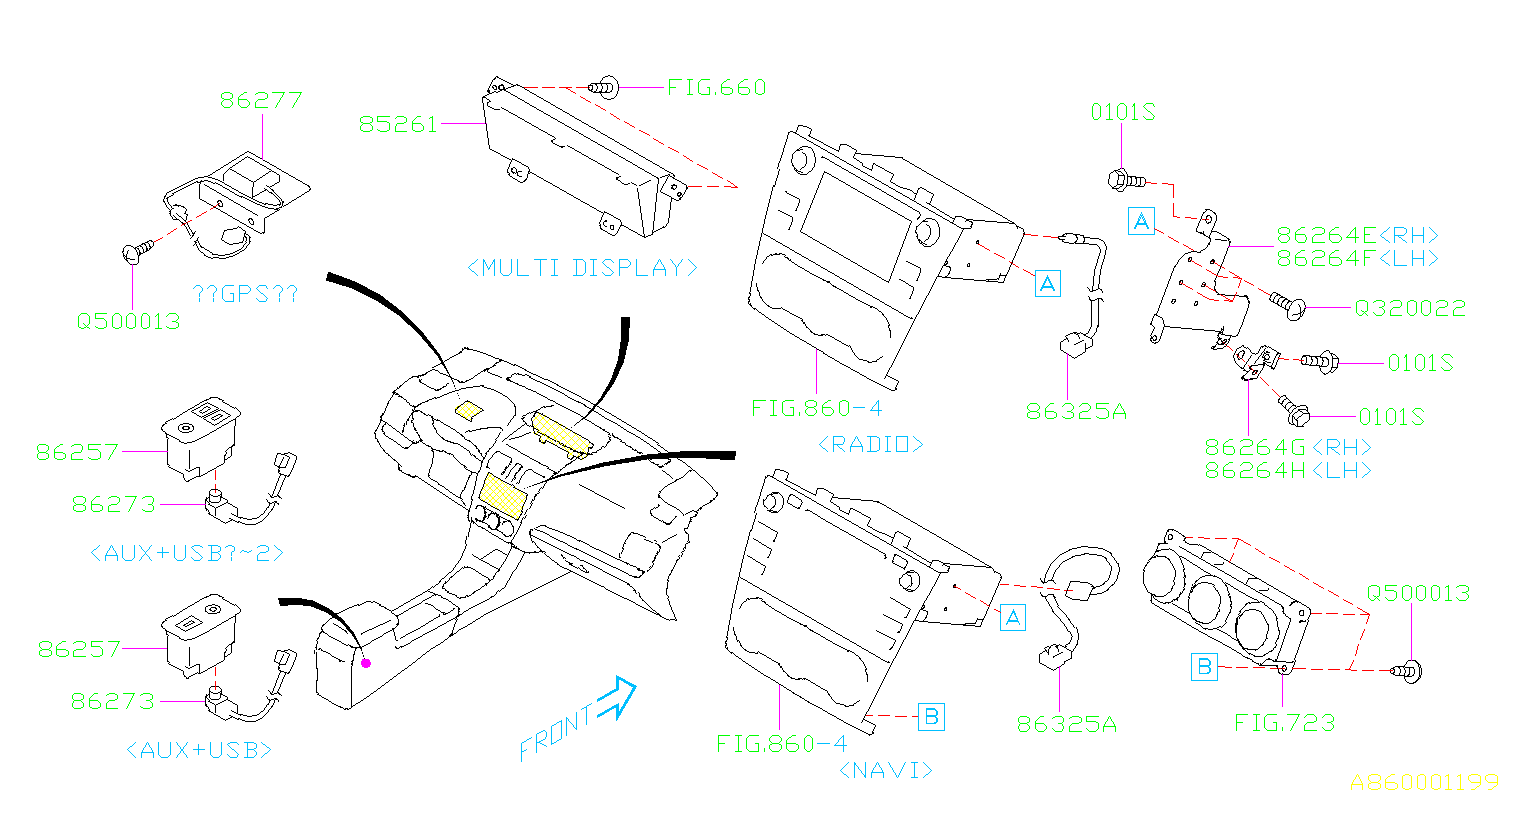 Subaru Impreza Radio Wiring Harness  Feeder Cord Adp